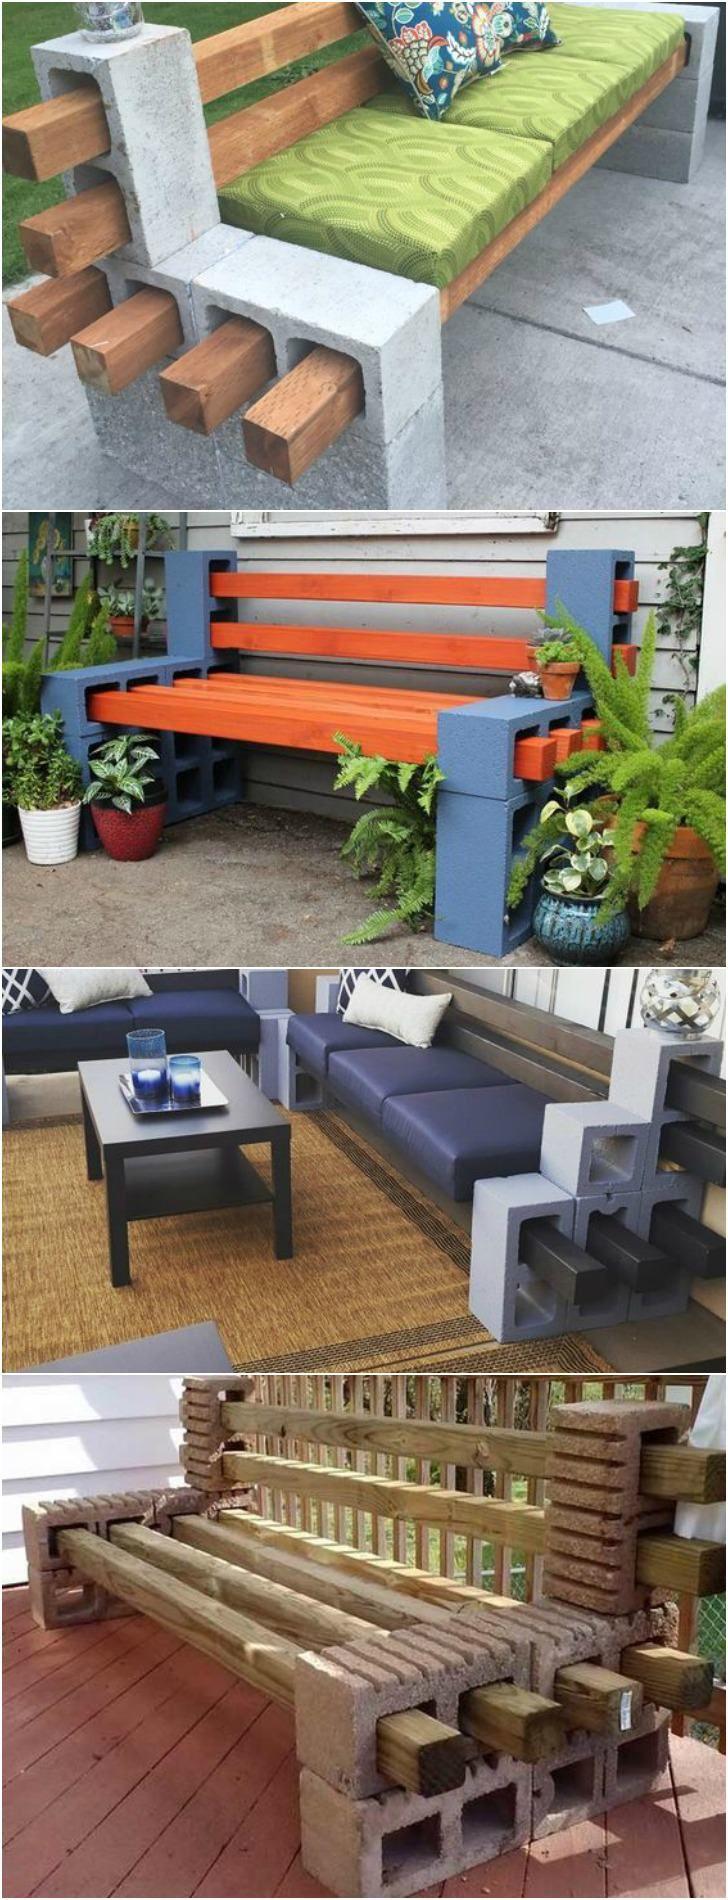 137 best exterior ideas images on pinterest   decks, gardening and